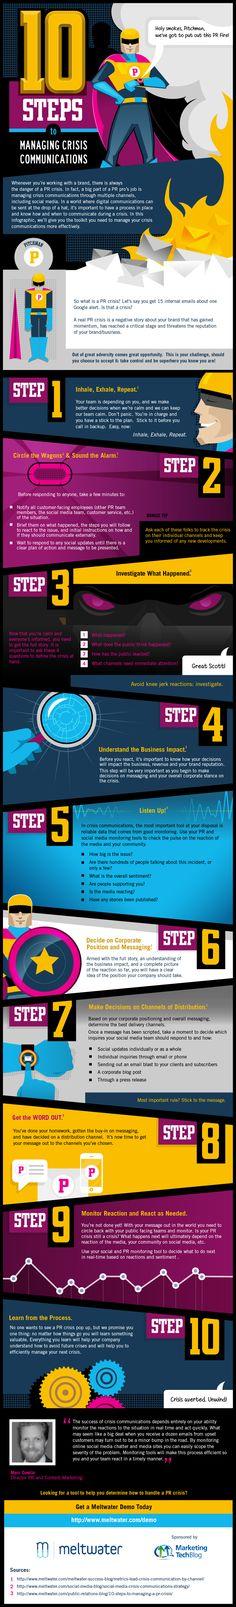 10 Steps to Managing Crisis Communication